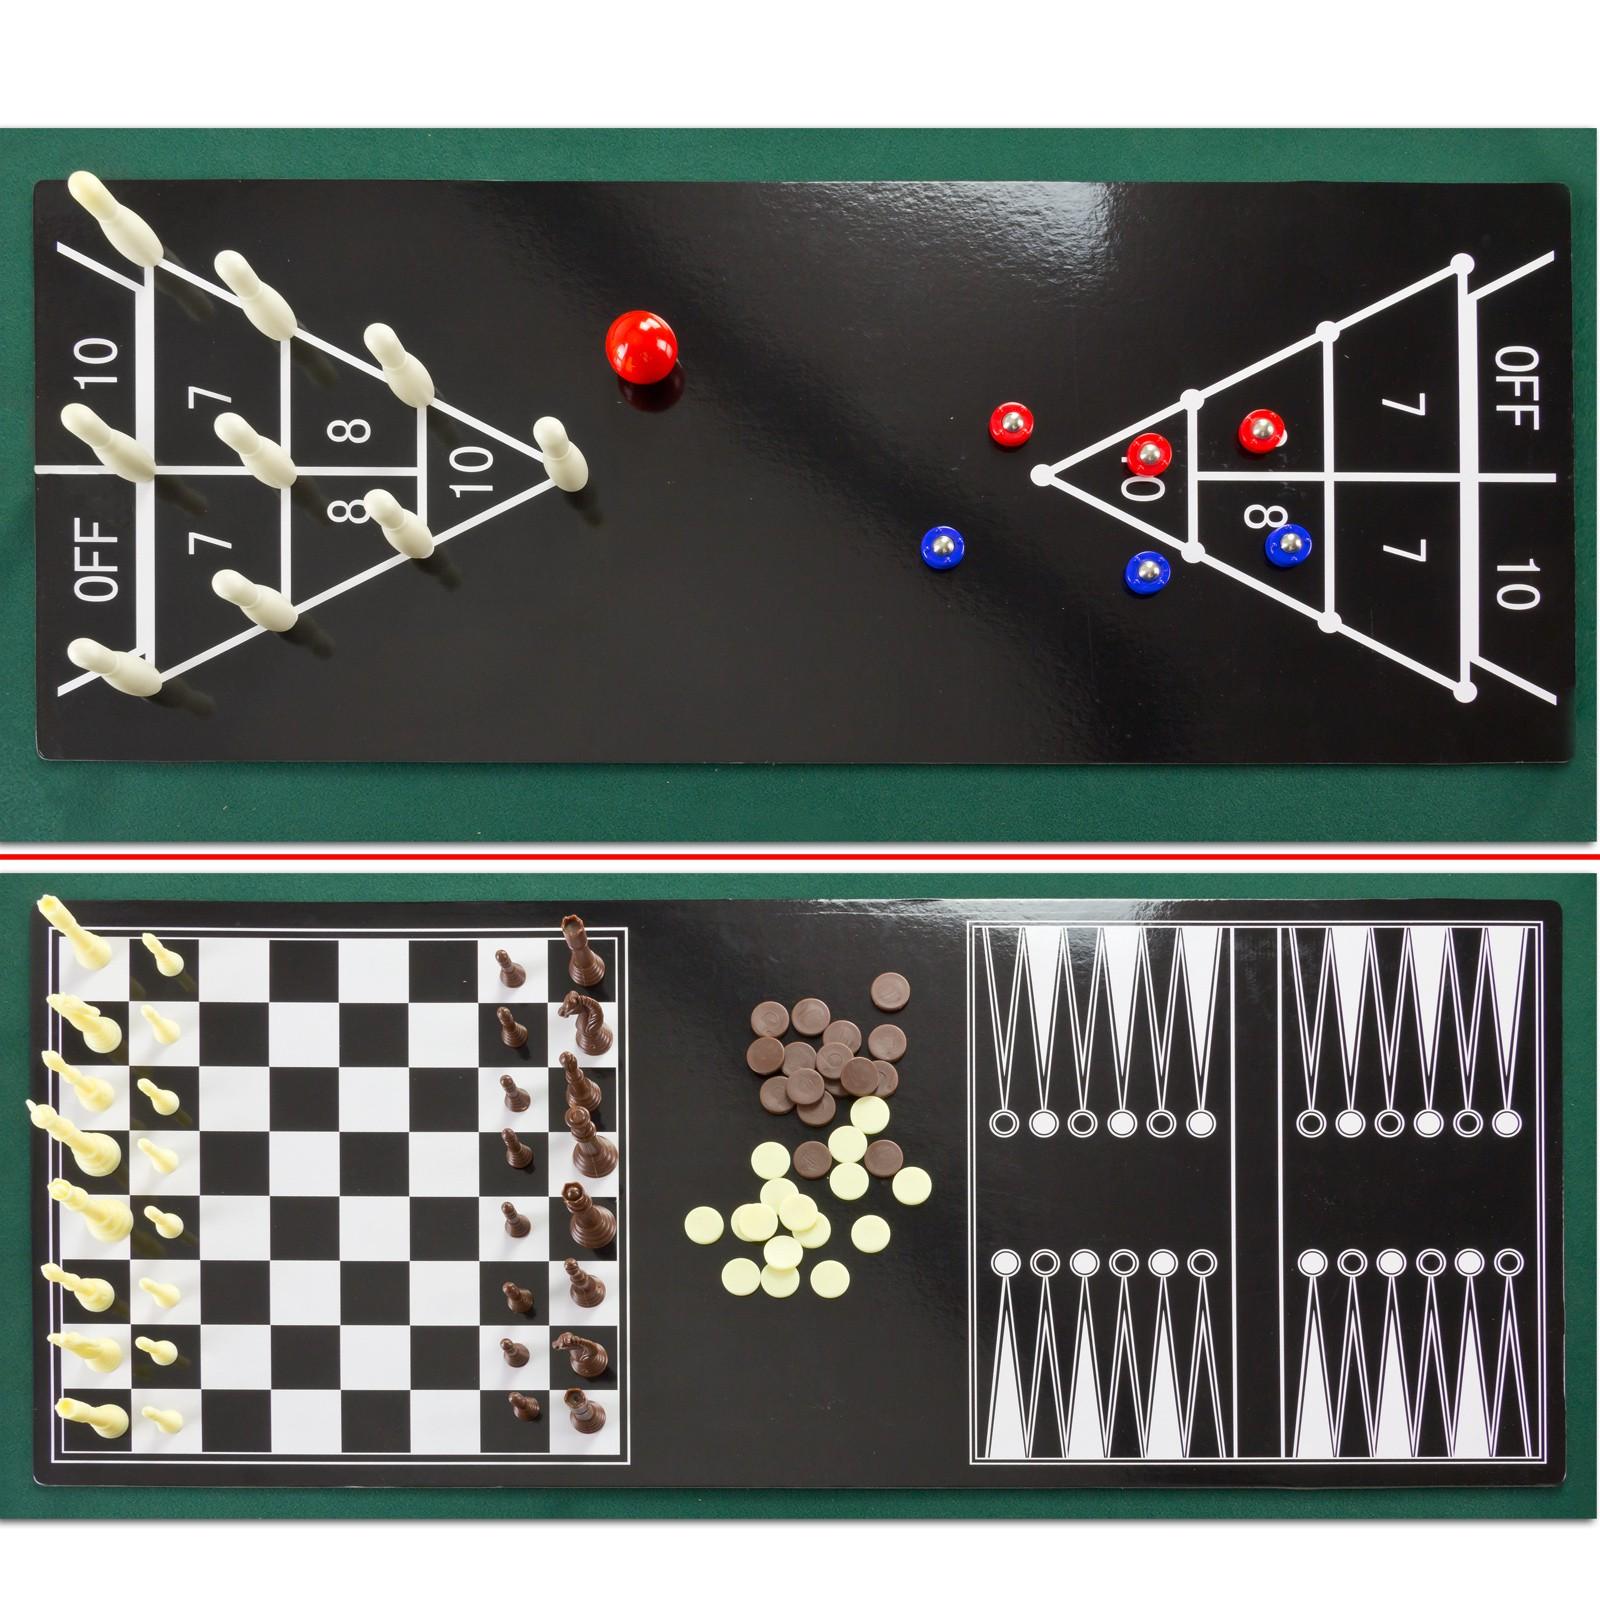 I like billard games